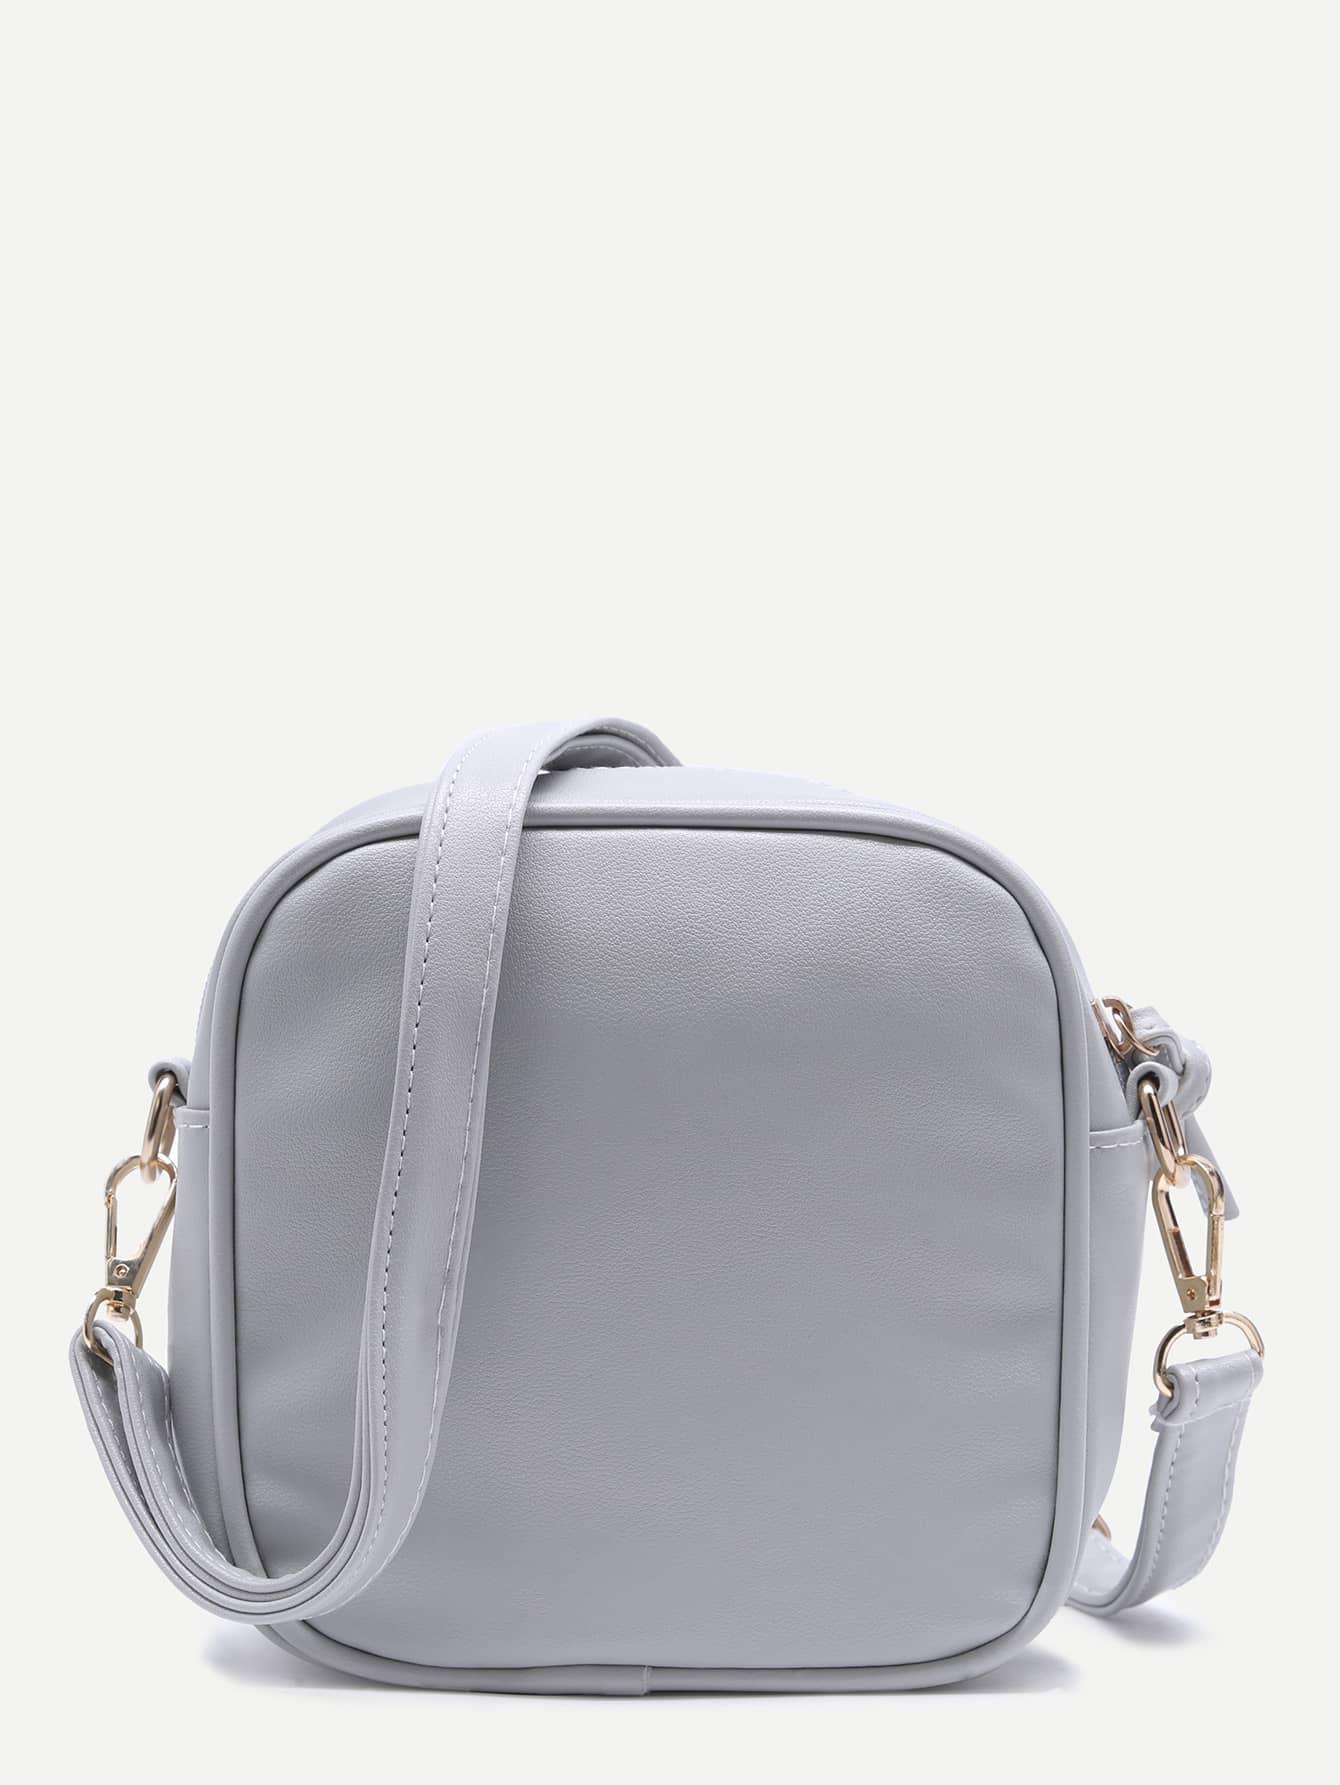 bag161025313_2